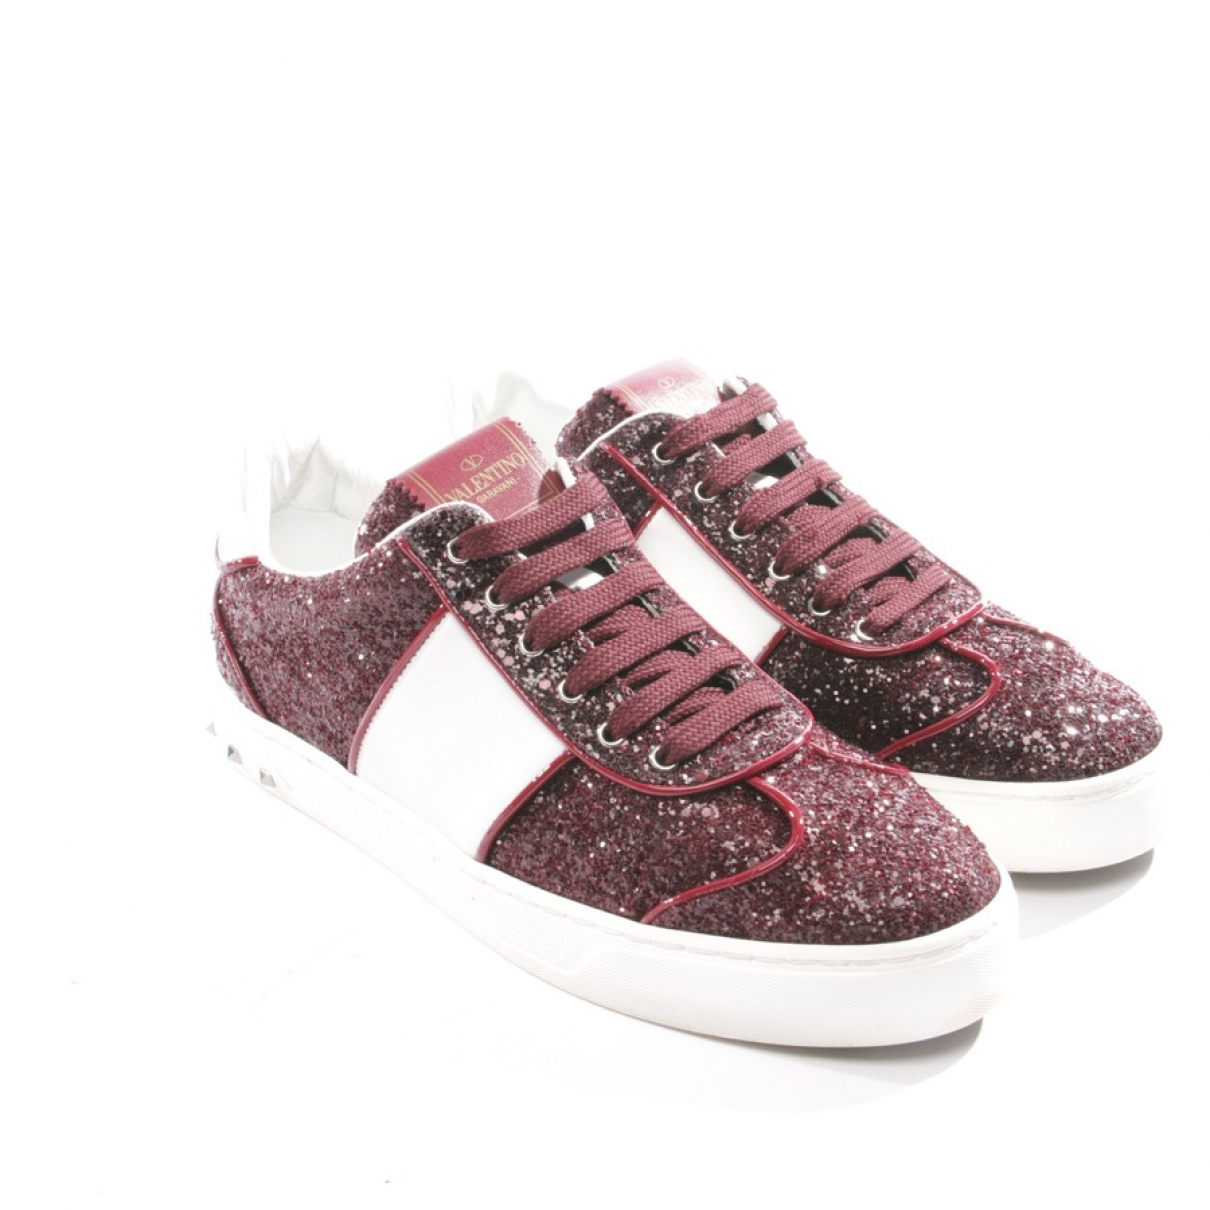 Valentino Garavani Rockstud Sneakers in  Rot Mit Pailletten